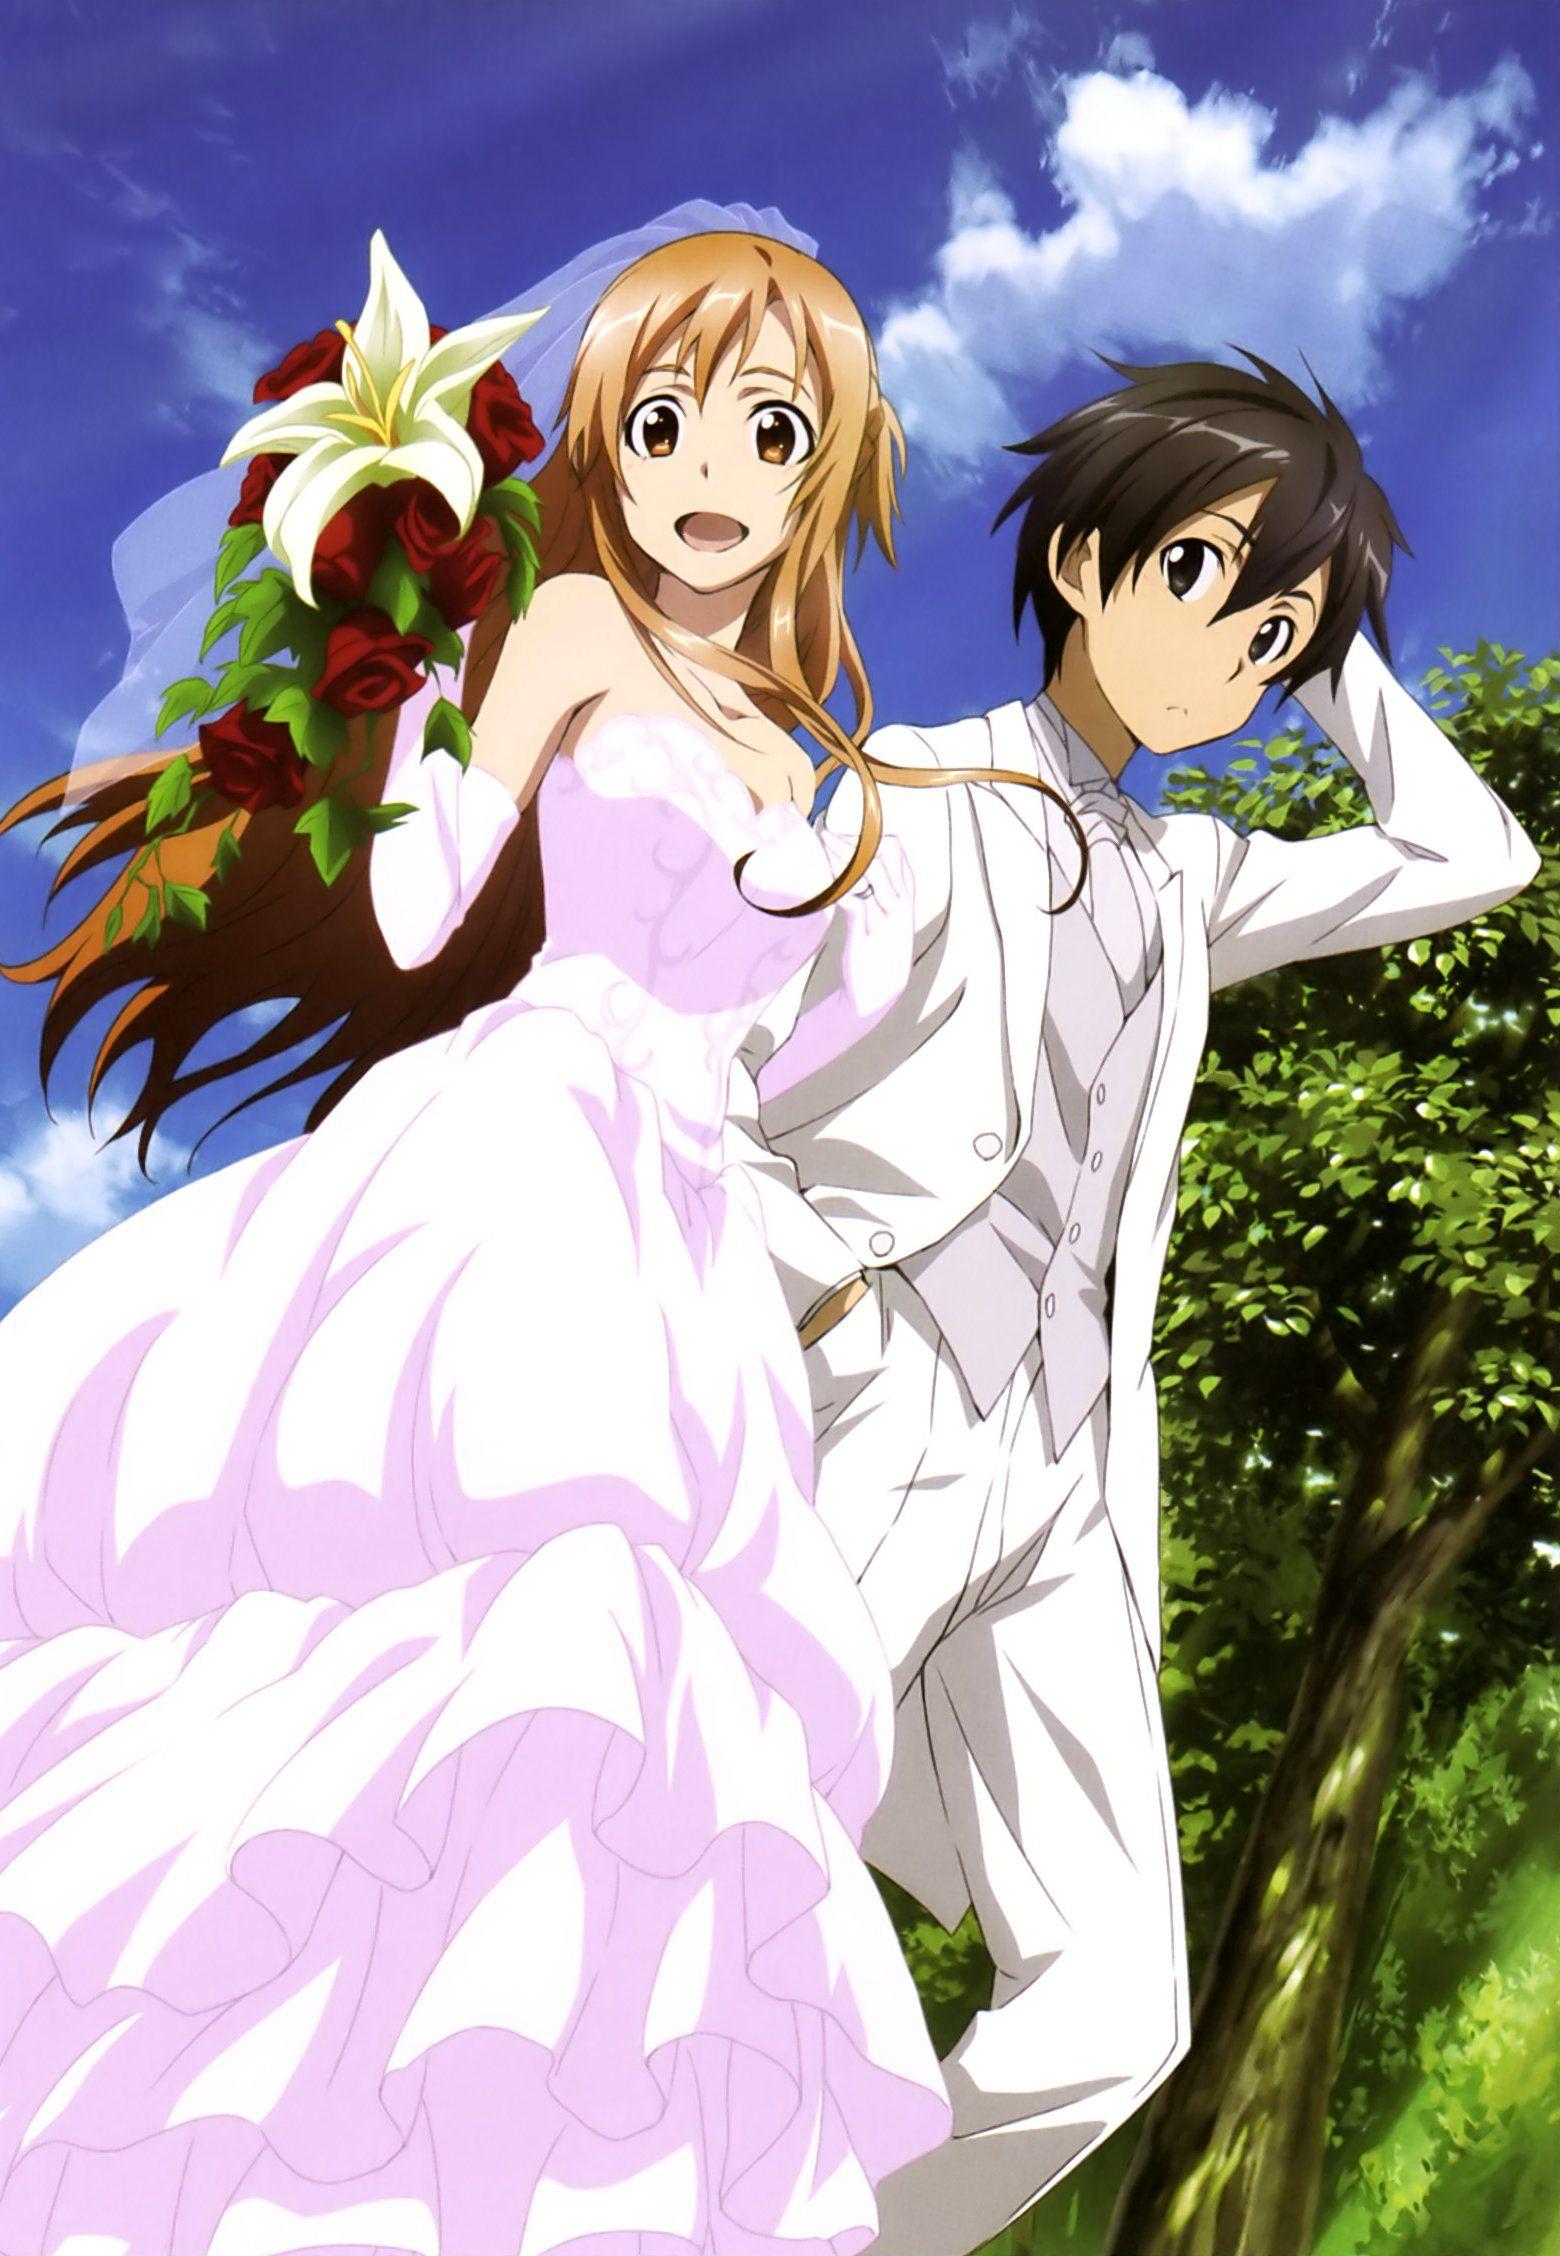 Sword Art Online Asuna Kirito Official So Cute I Like It